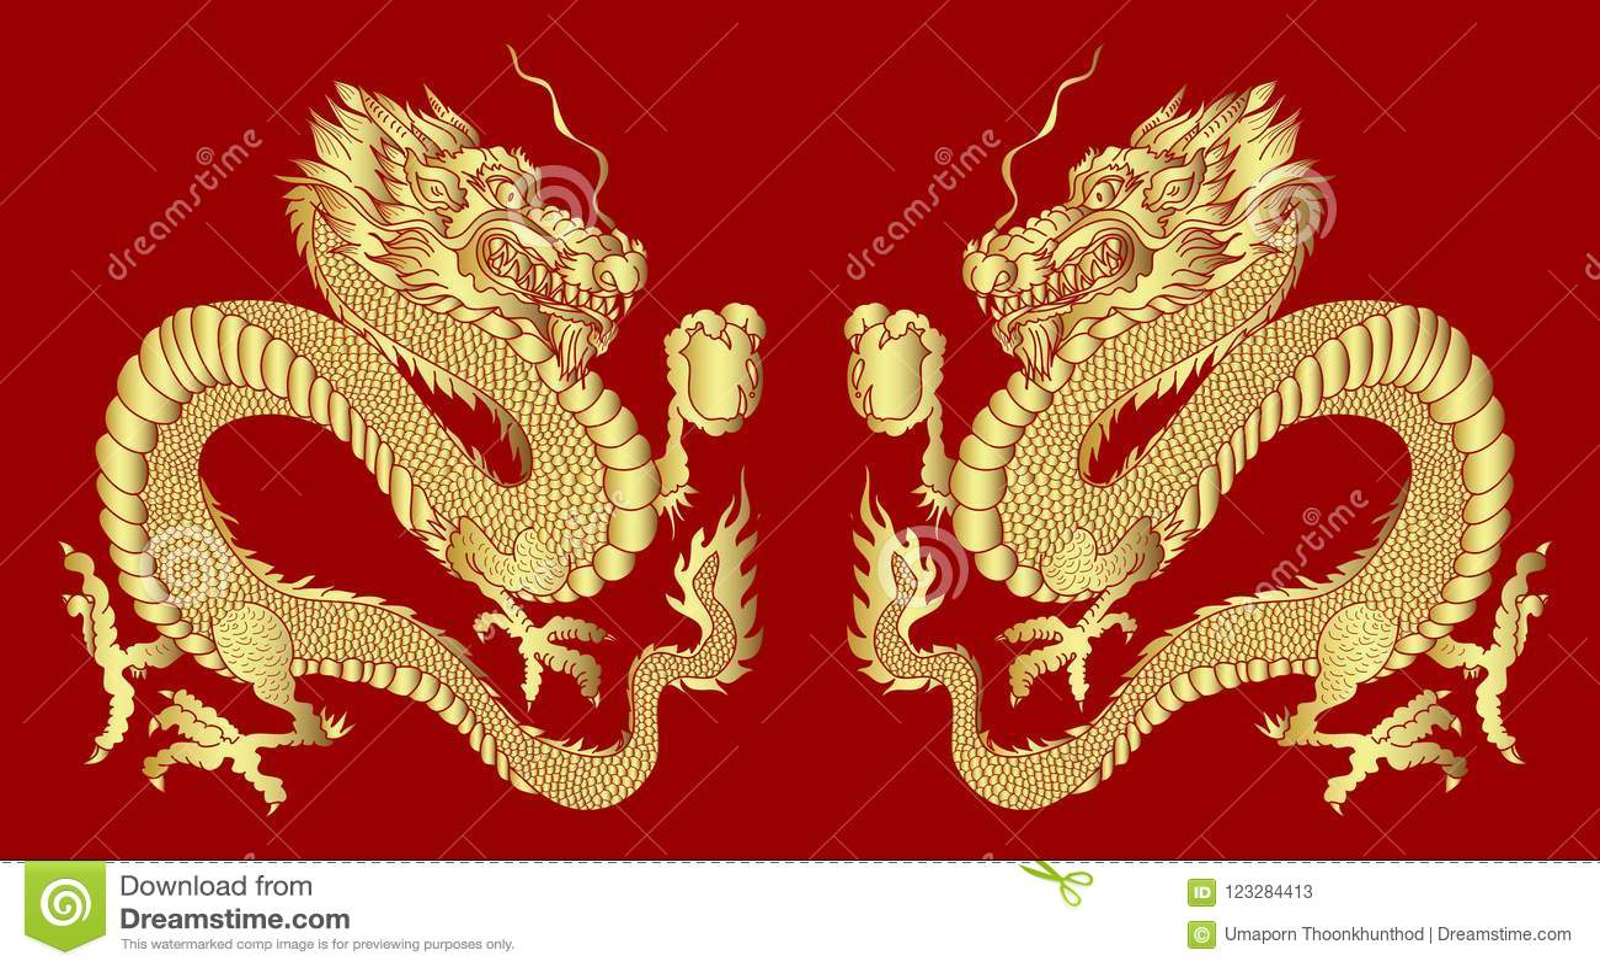 Chinese new year golden dragon shiroka lyka labs